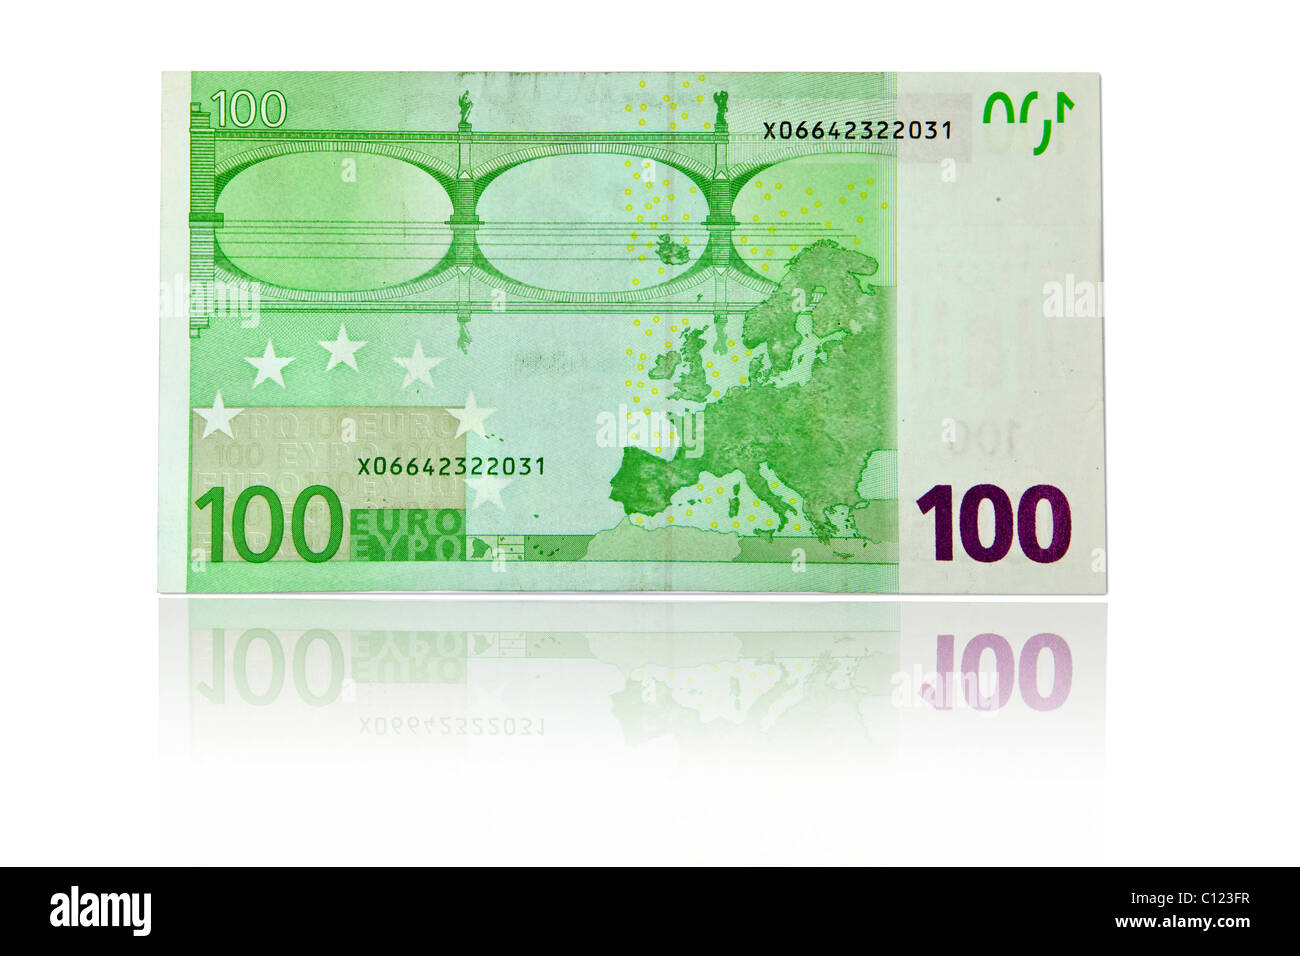 123 Fr 100 euro banknote, back stock photo: 35082091 - alamy